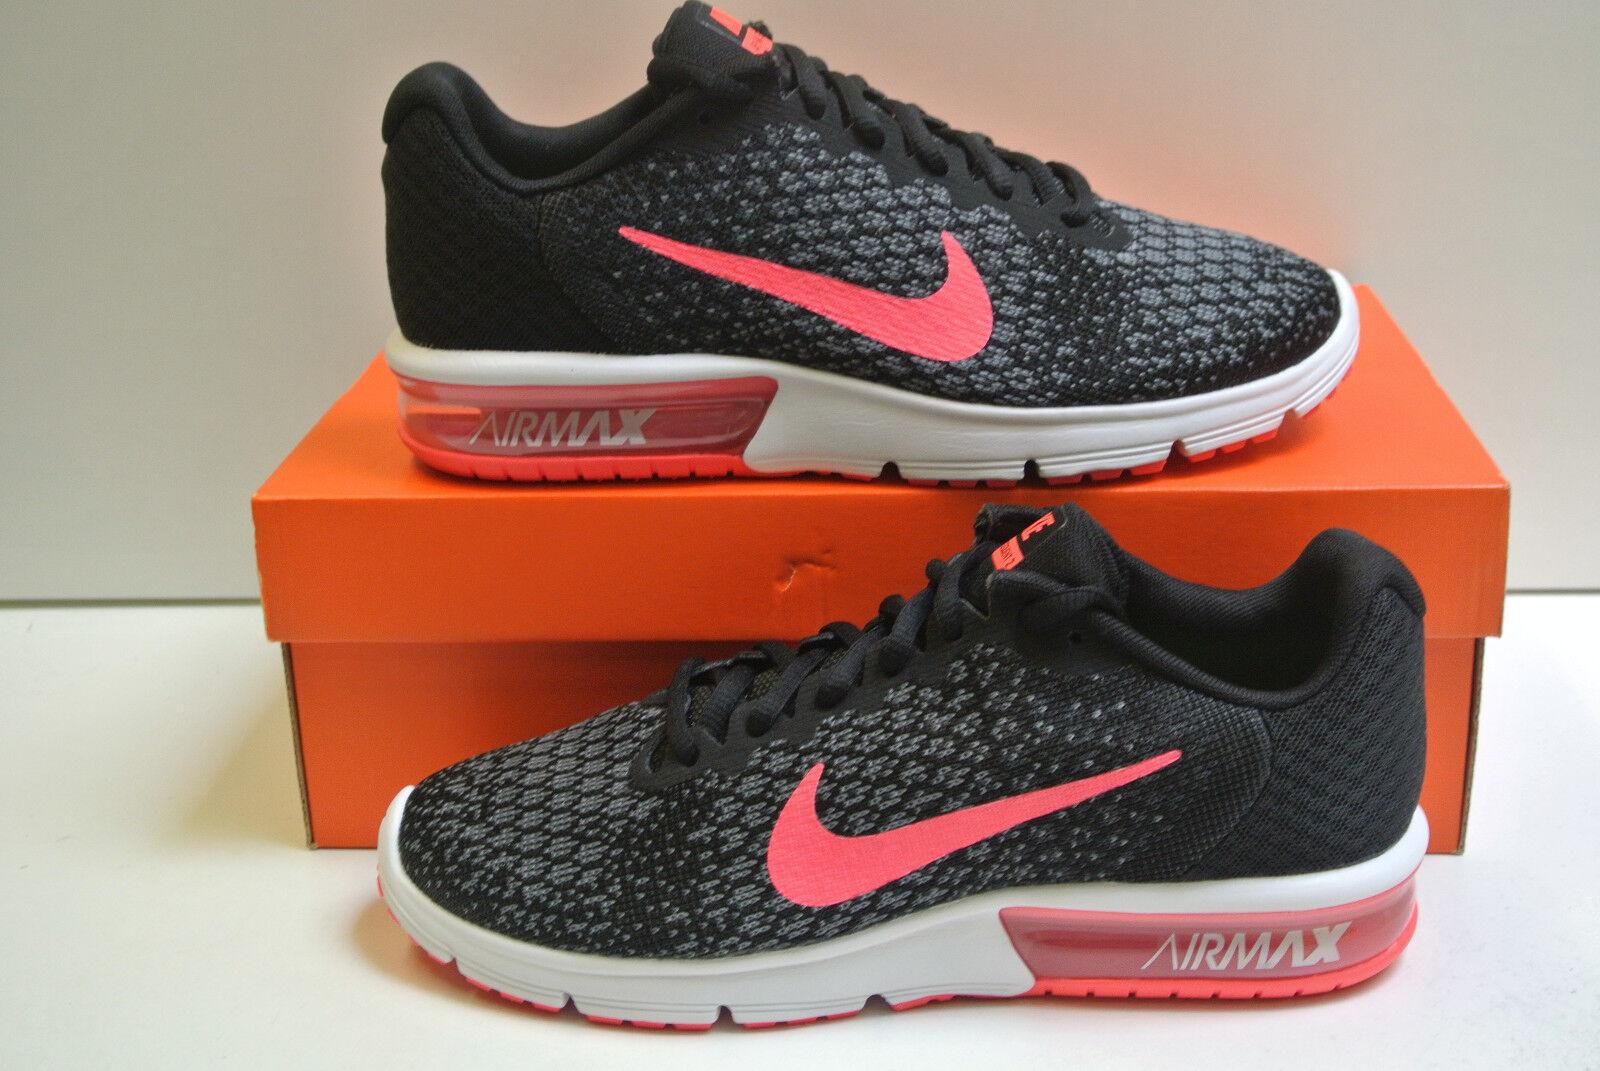 Wmns Nike Air Max Sequent Sequent Max 2 Tamaño Seleccionable Nuevo & Emp Orig 852465 006 5cc045